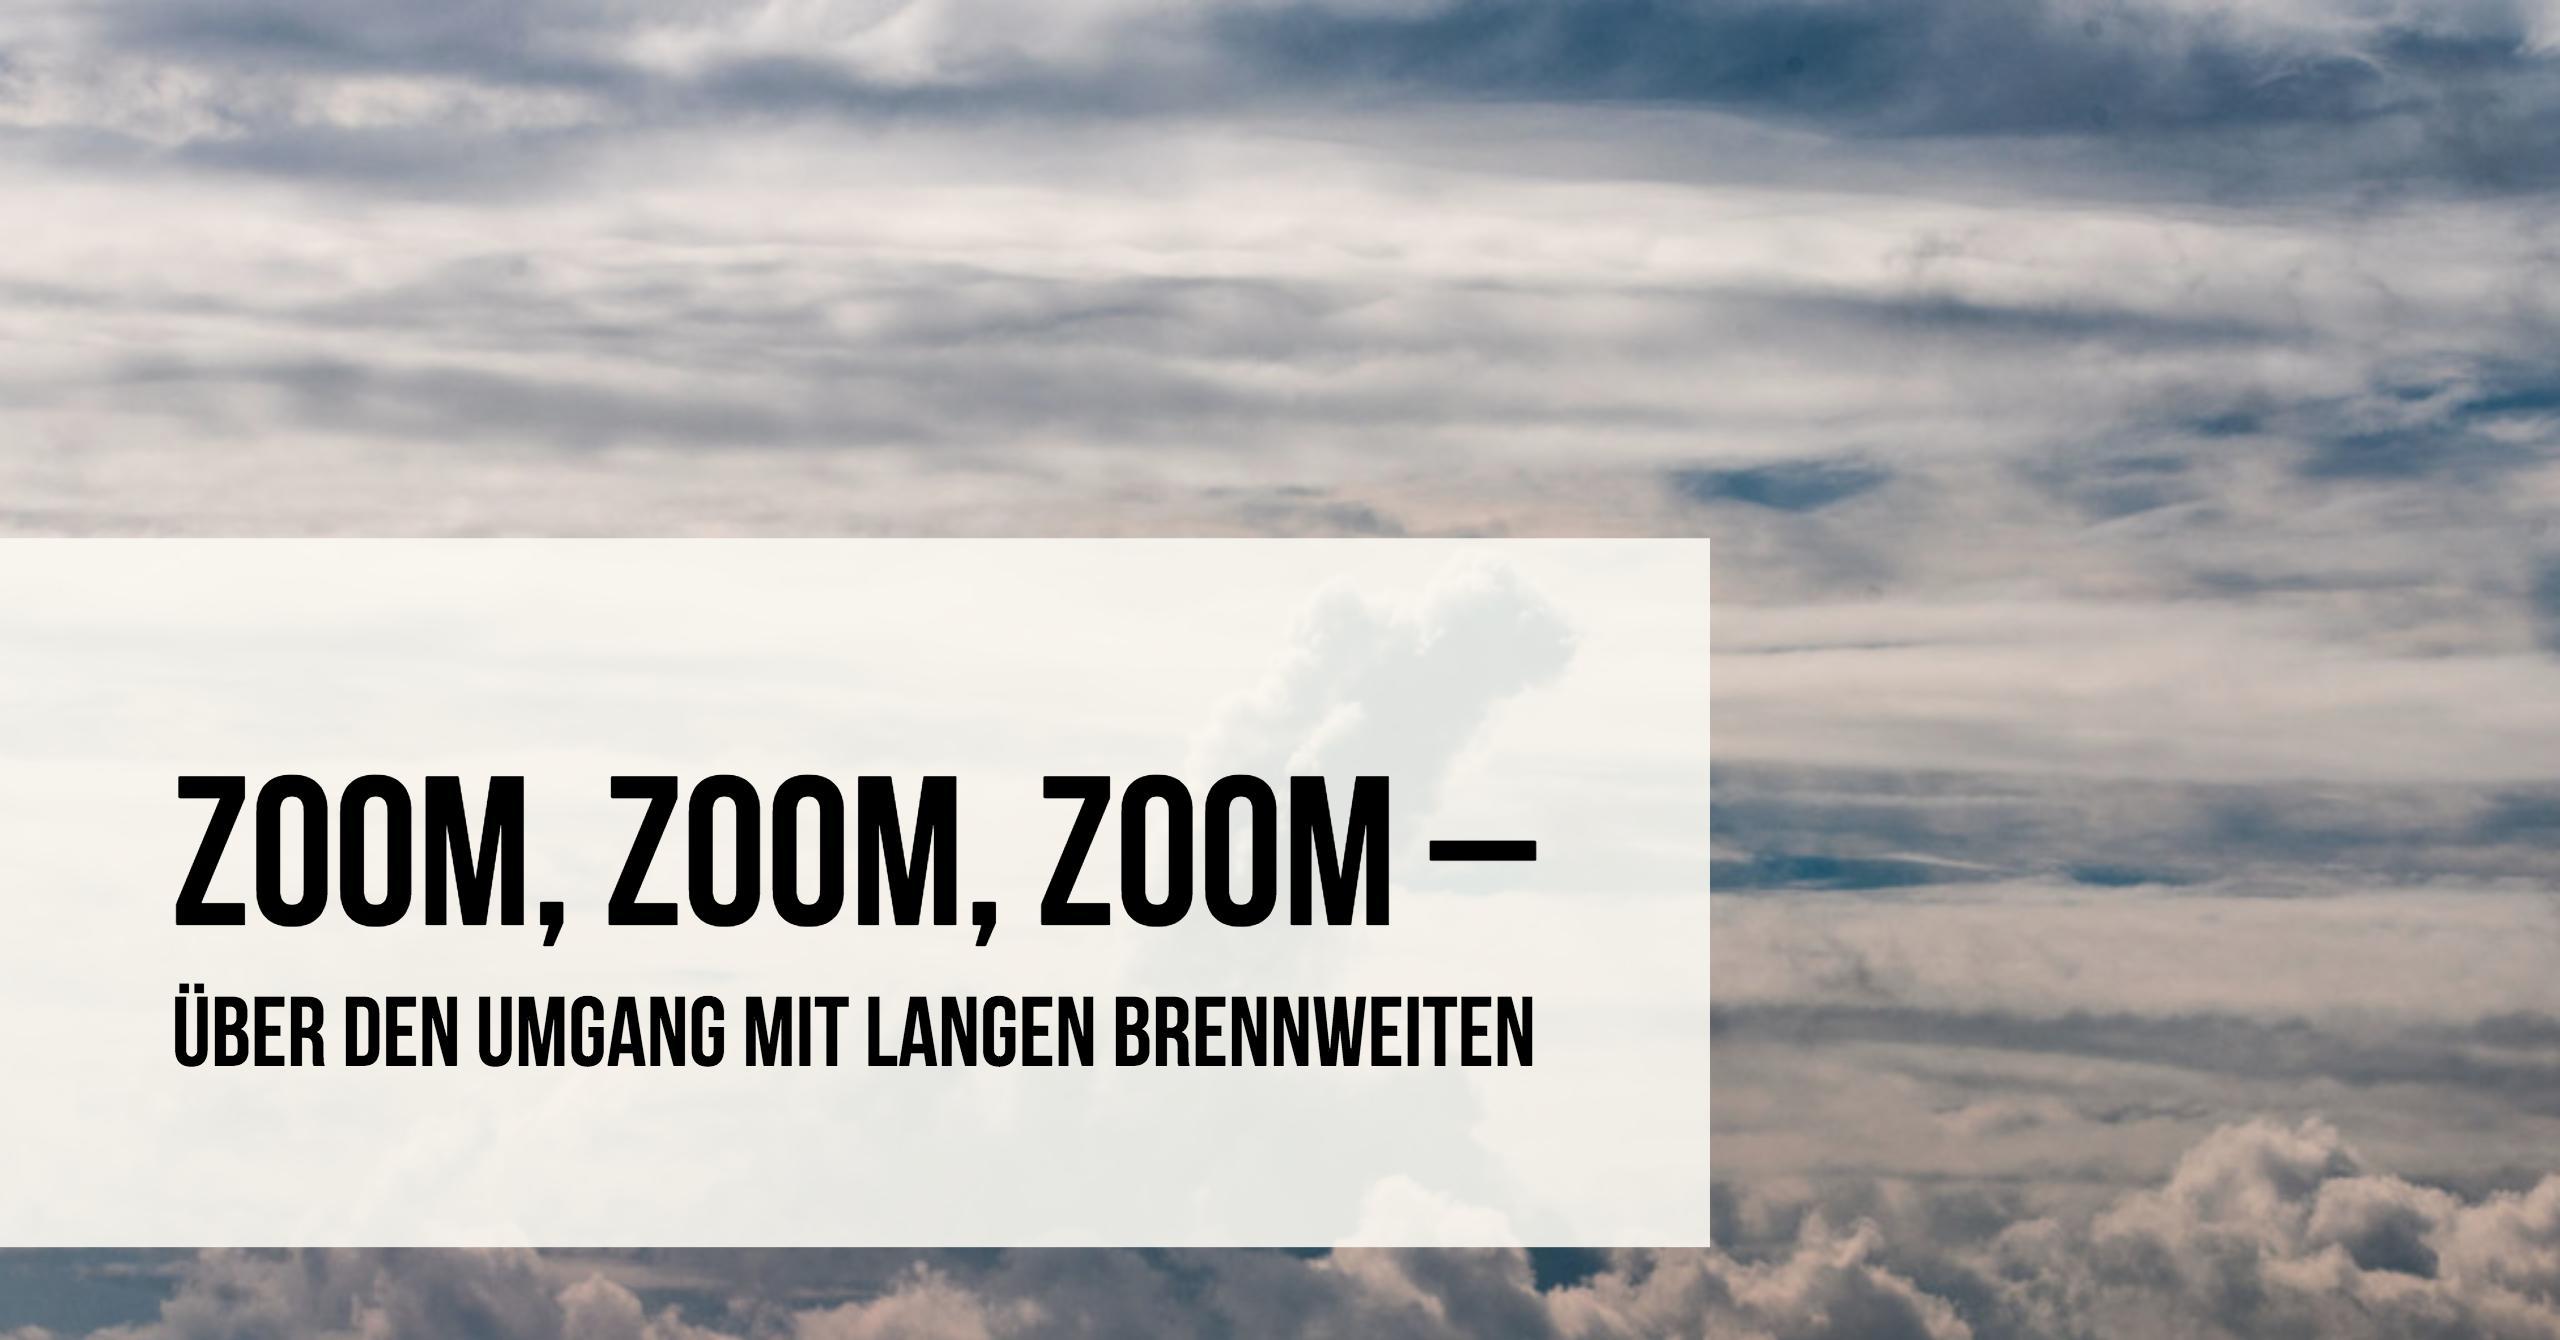 zoom-zoom-zoom-umgang-lange-brennweiten-teaser